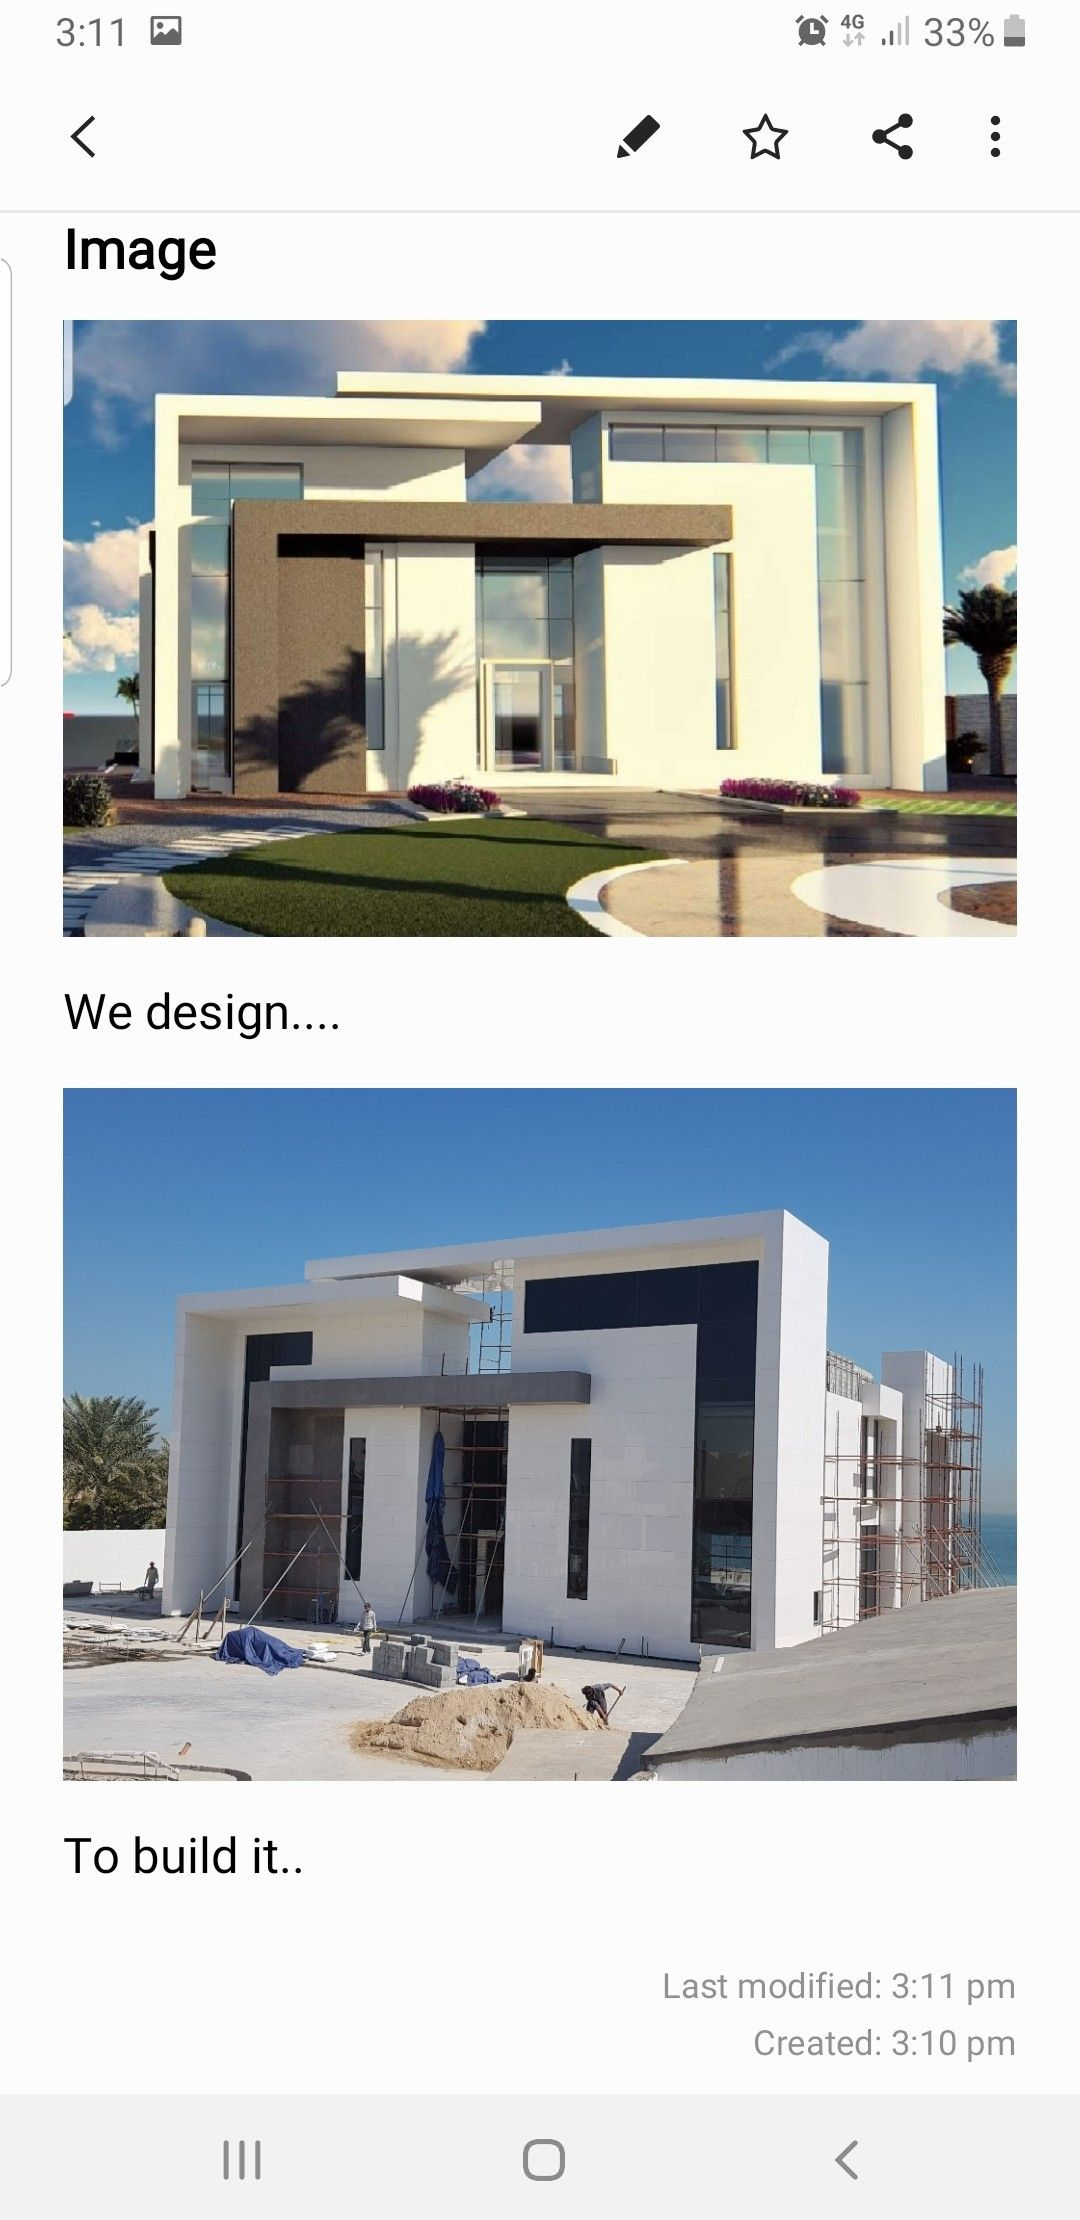 Designed & built by CPC (Construction principles company